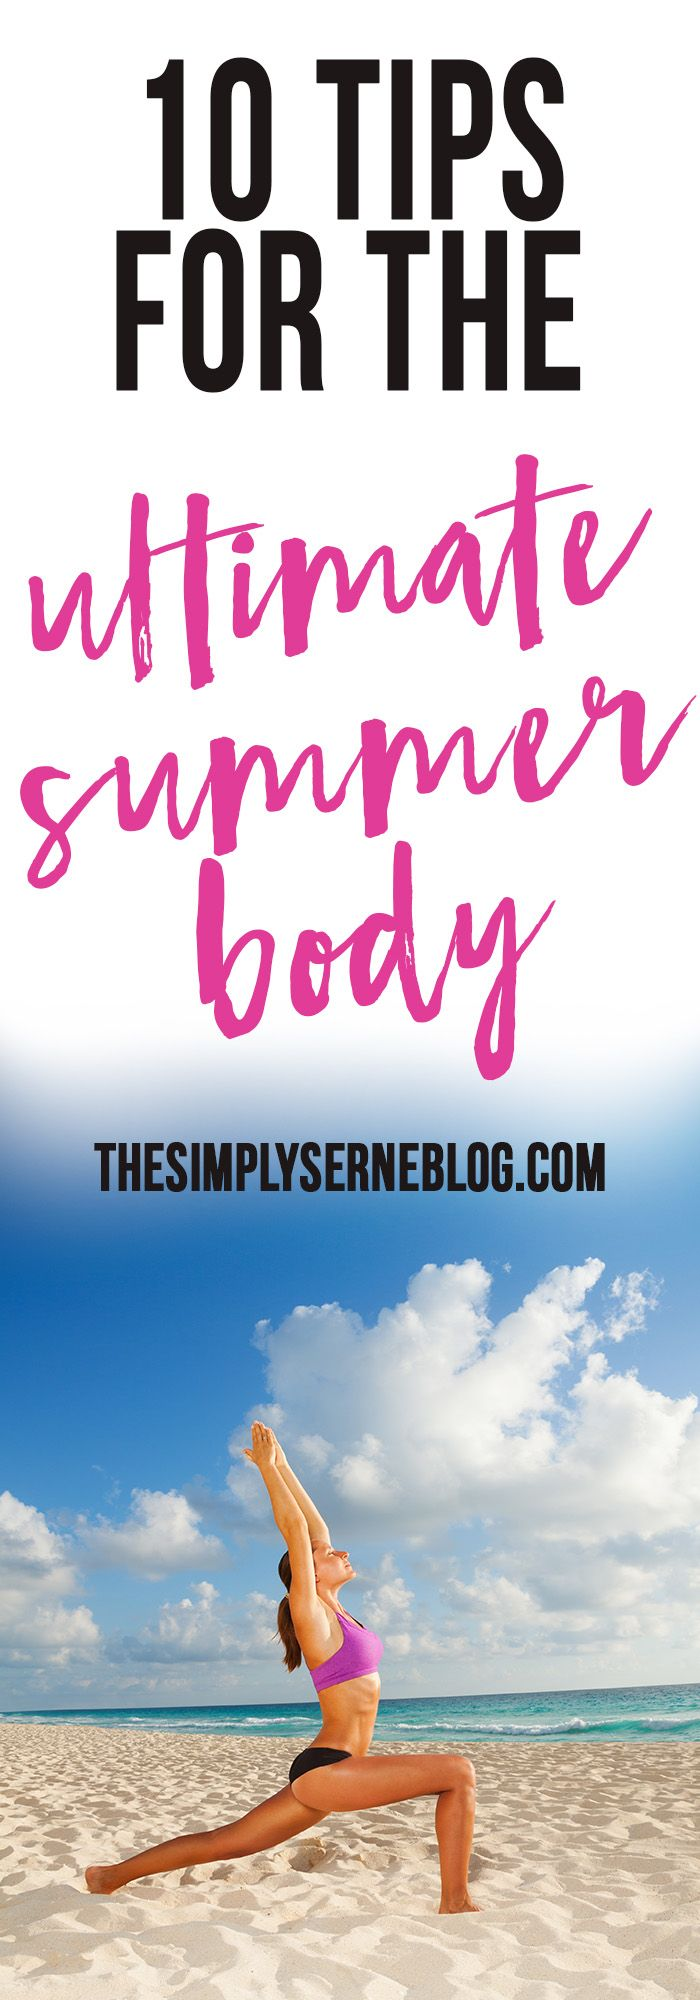 Summer body motivation | Summer body goals | Tips for the ultimate summer body | Summer body inspiration | Bikini body plan | How to get a Summer Bikini Body Fast | Perfect summer body inso